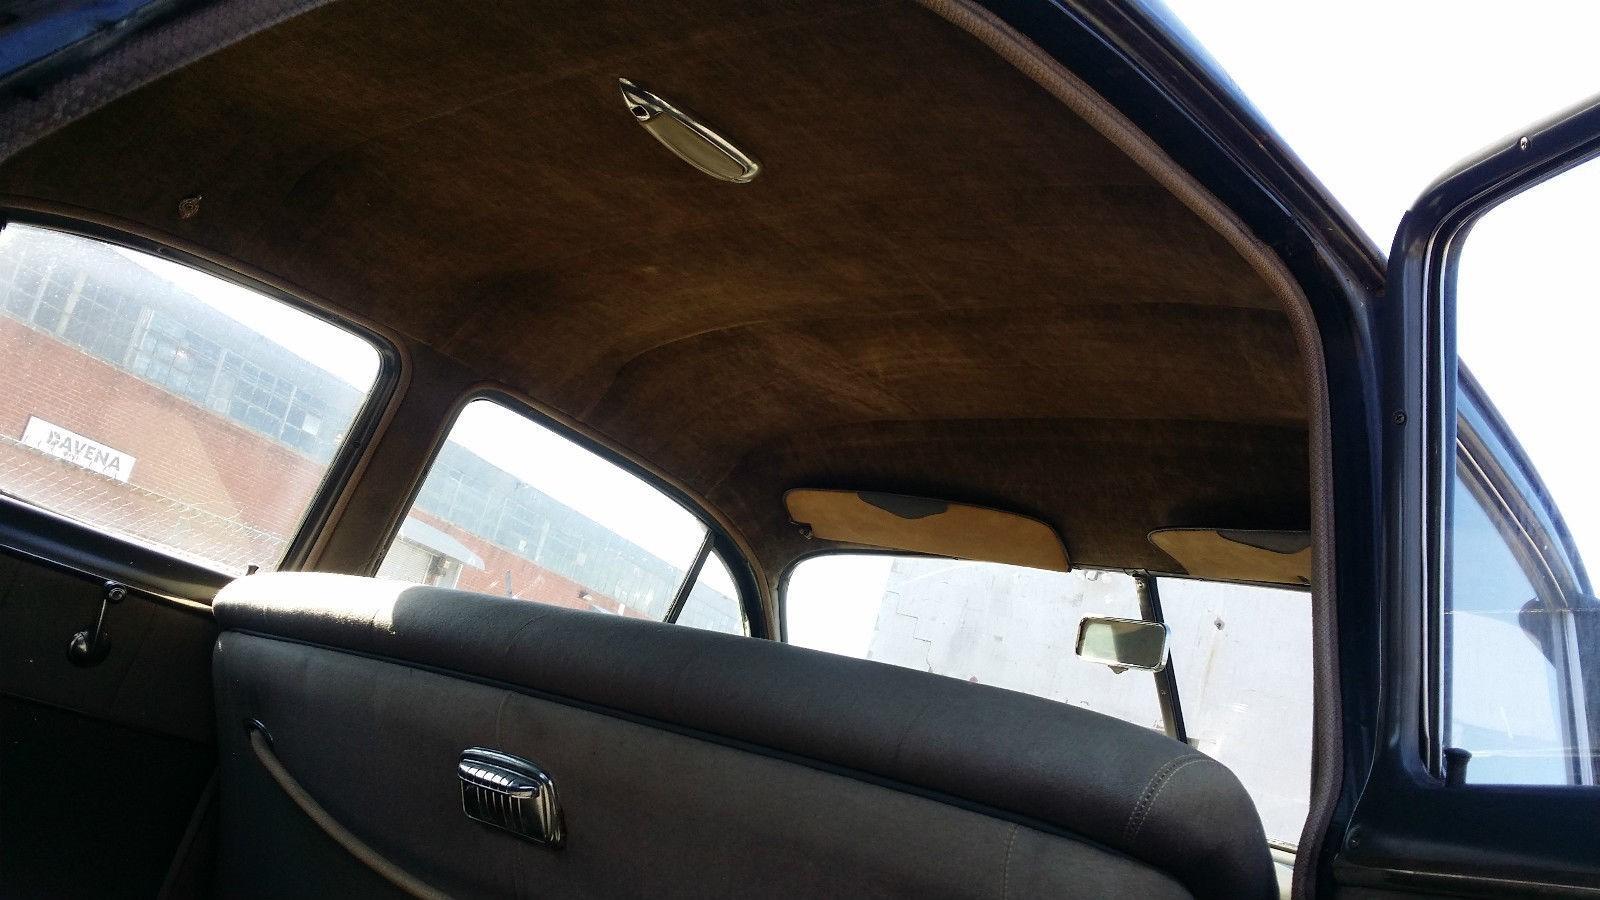 1950 Pontiac Chieftain Eight Deluxe Sedan (24)